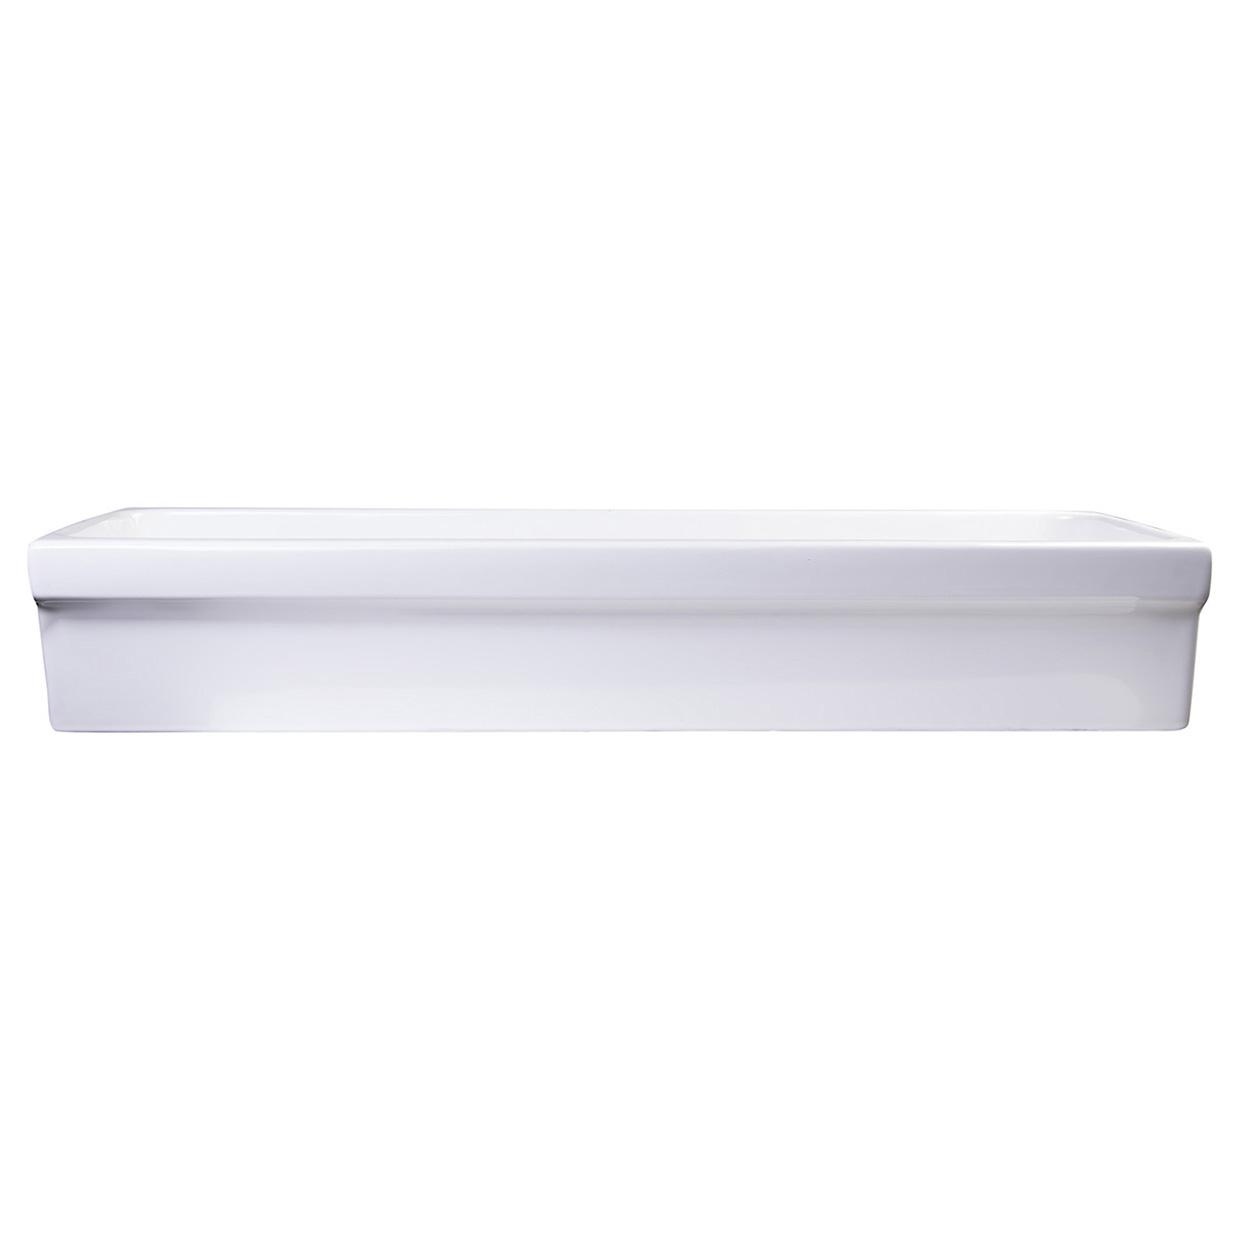 Bath4all Alfi Brand Ab48tr 48 White Above Mount Porcelain Bath Trough Sink